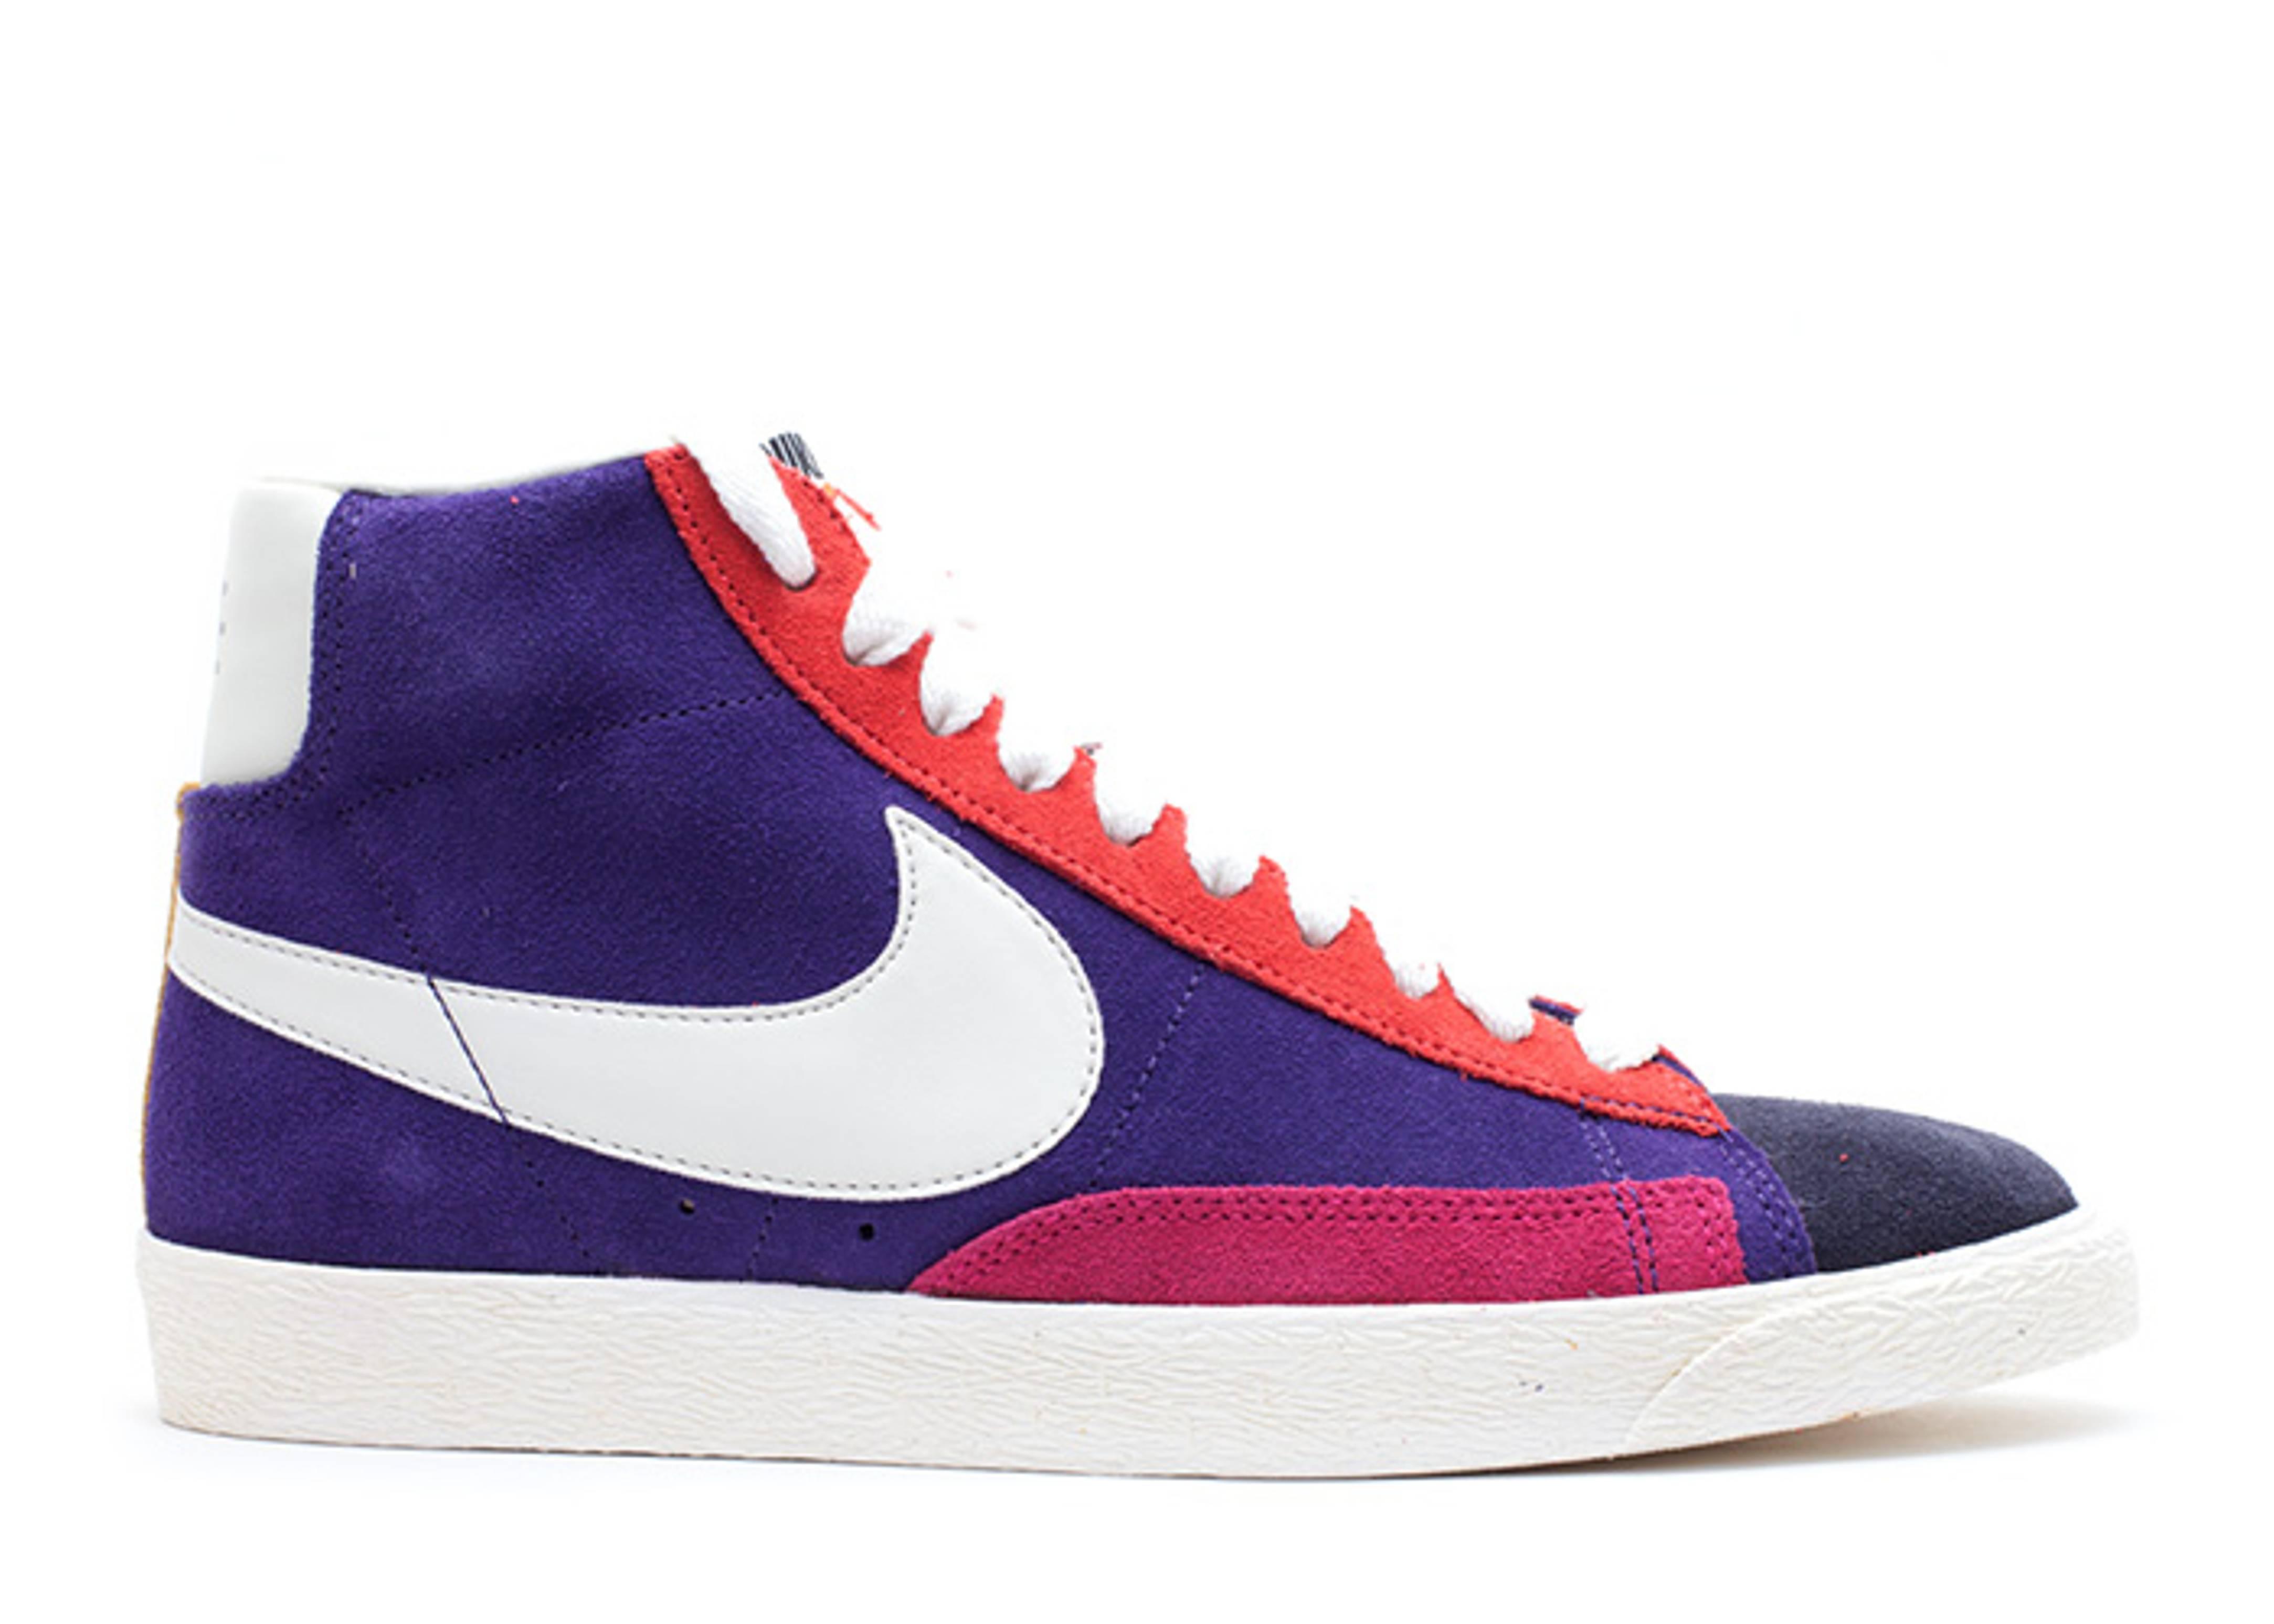 sale retailer 86b6c d5b10 Blazer Hi Suede (vntg) Qs - Nike - 508220 010 - gridiron ...